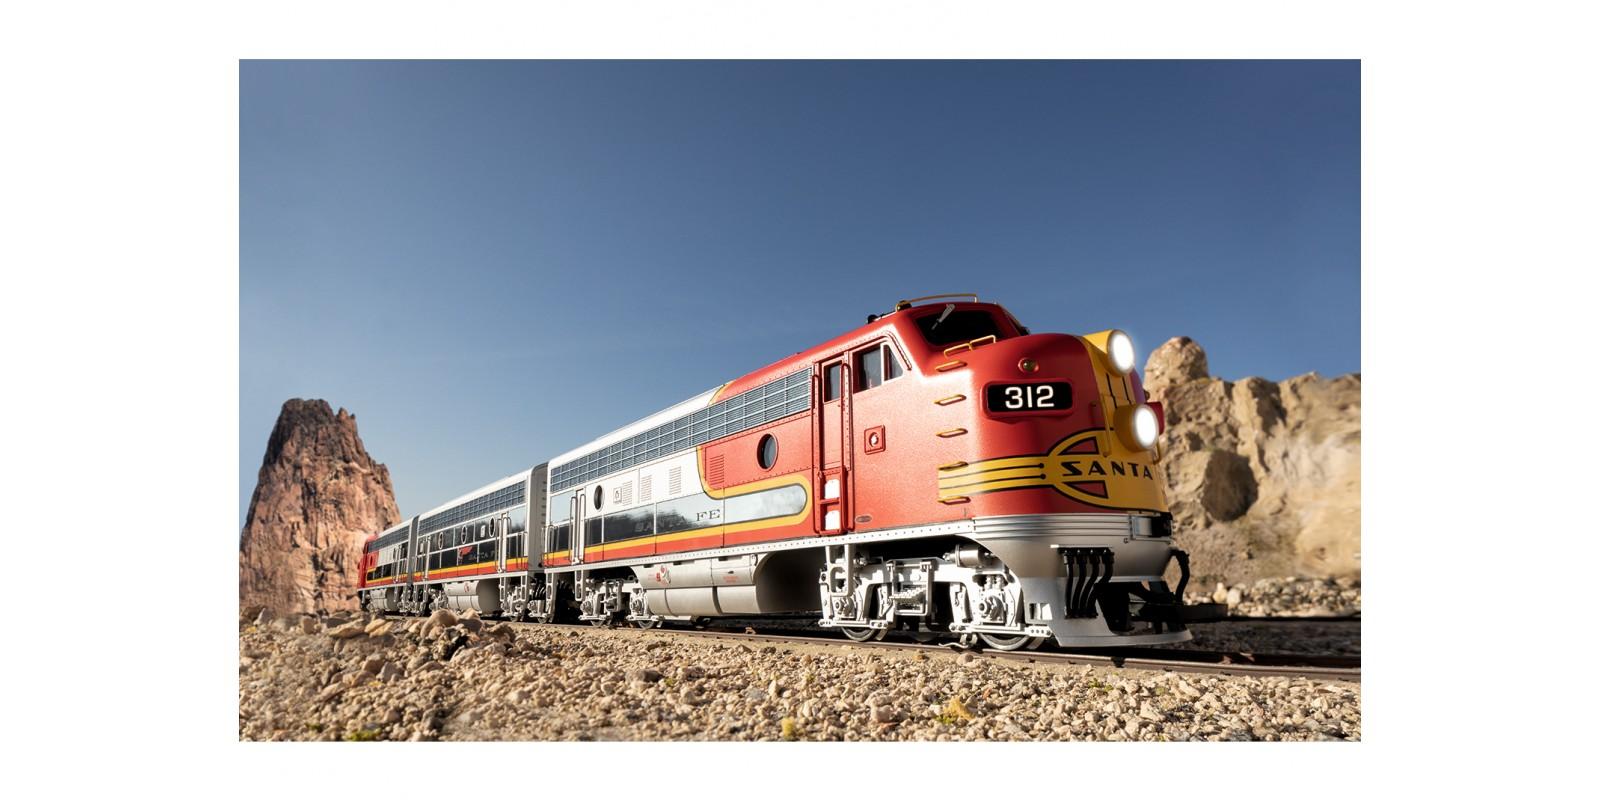 L20581 Santa Fe F7A Diesel Locomotive